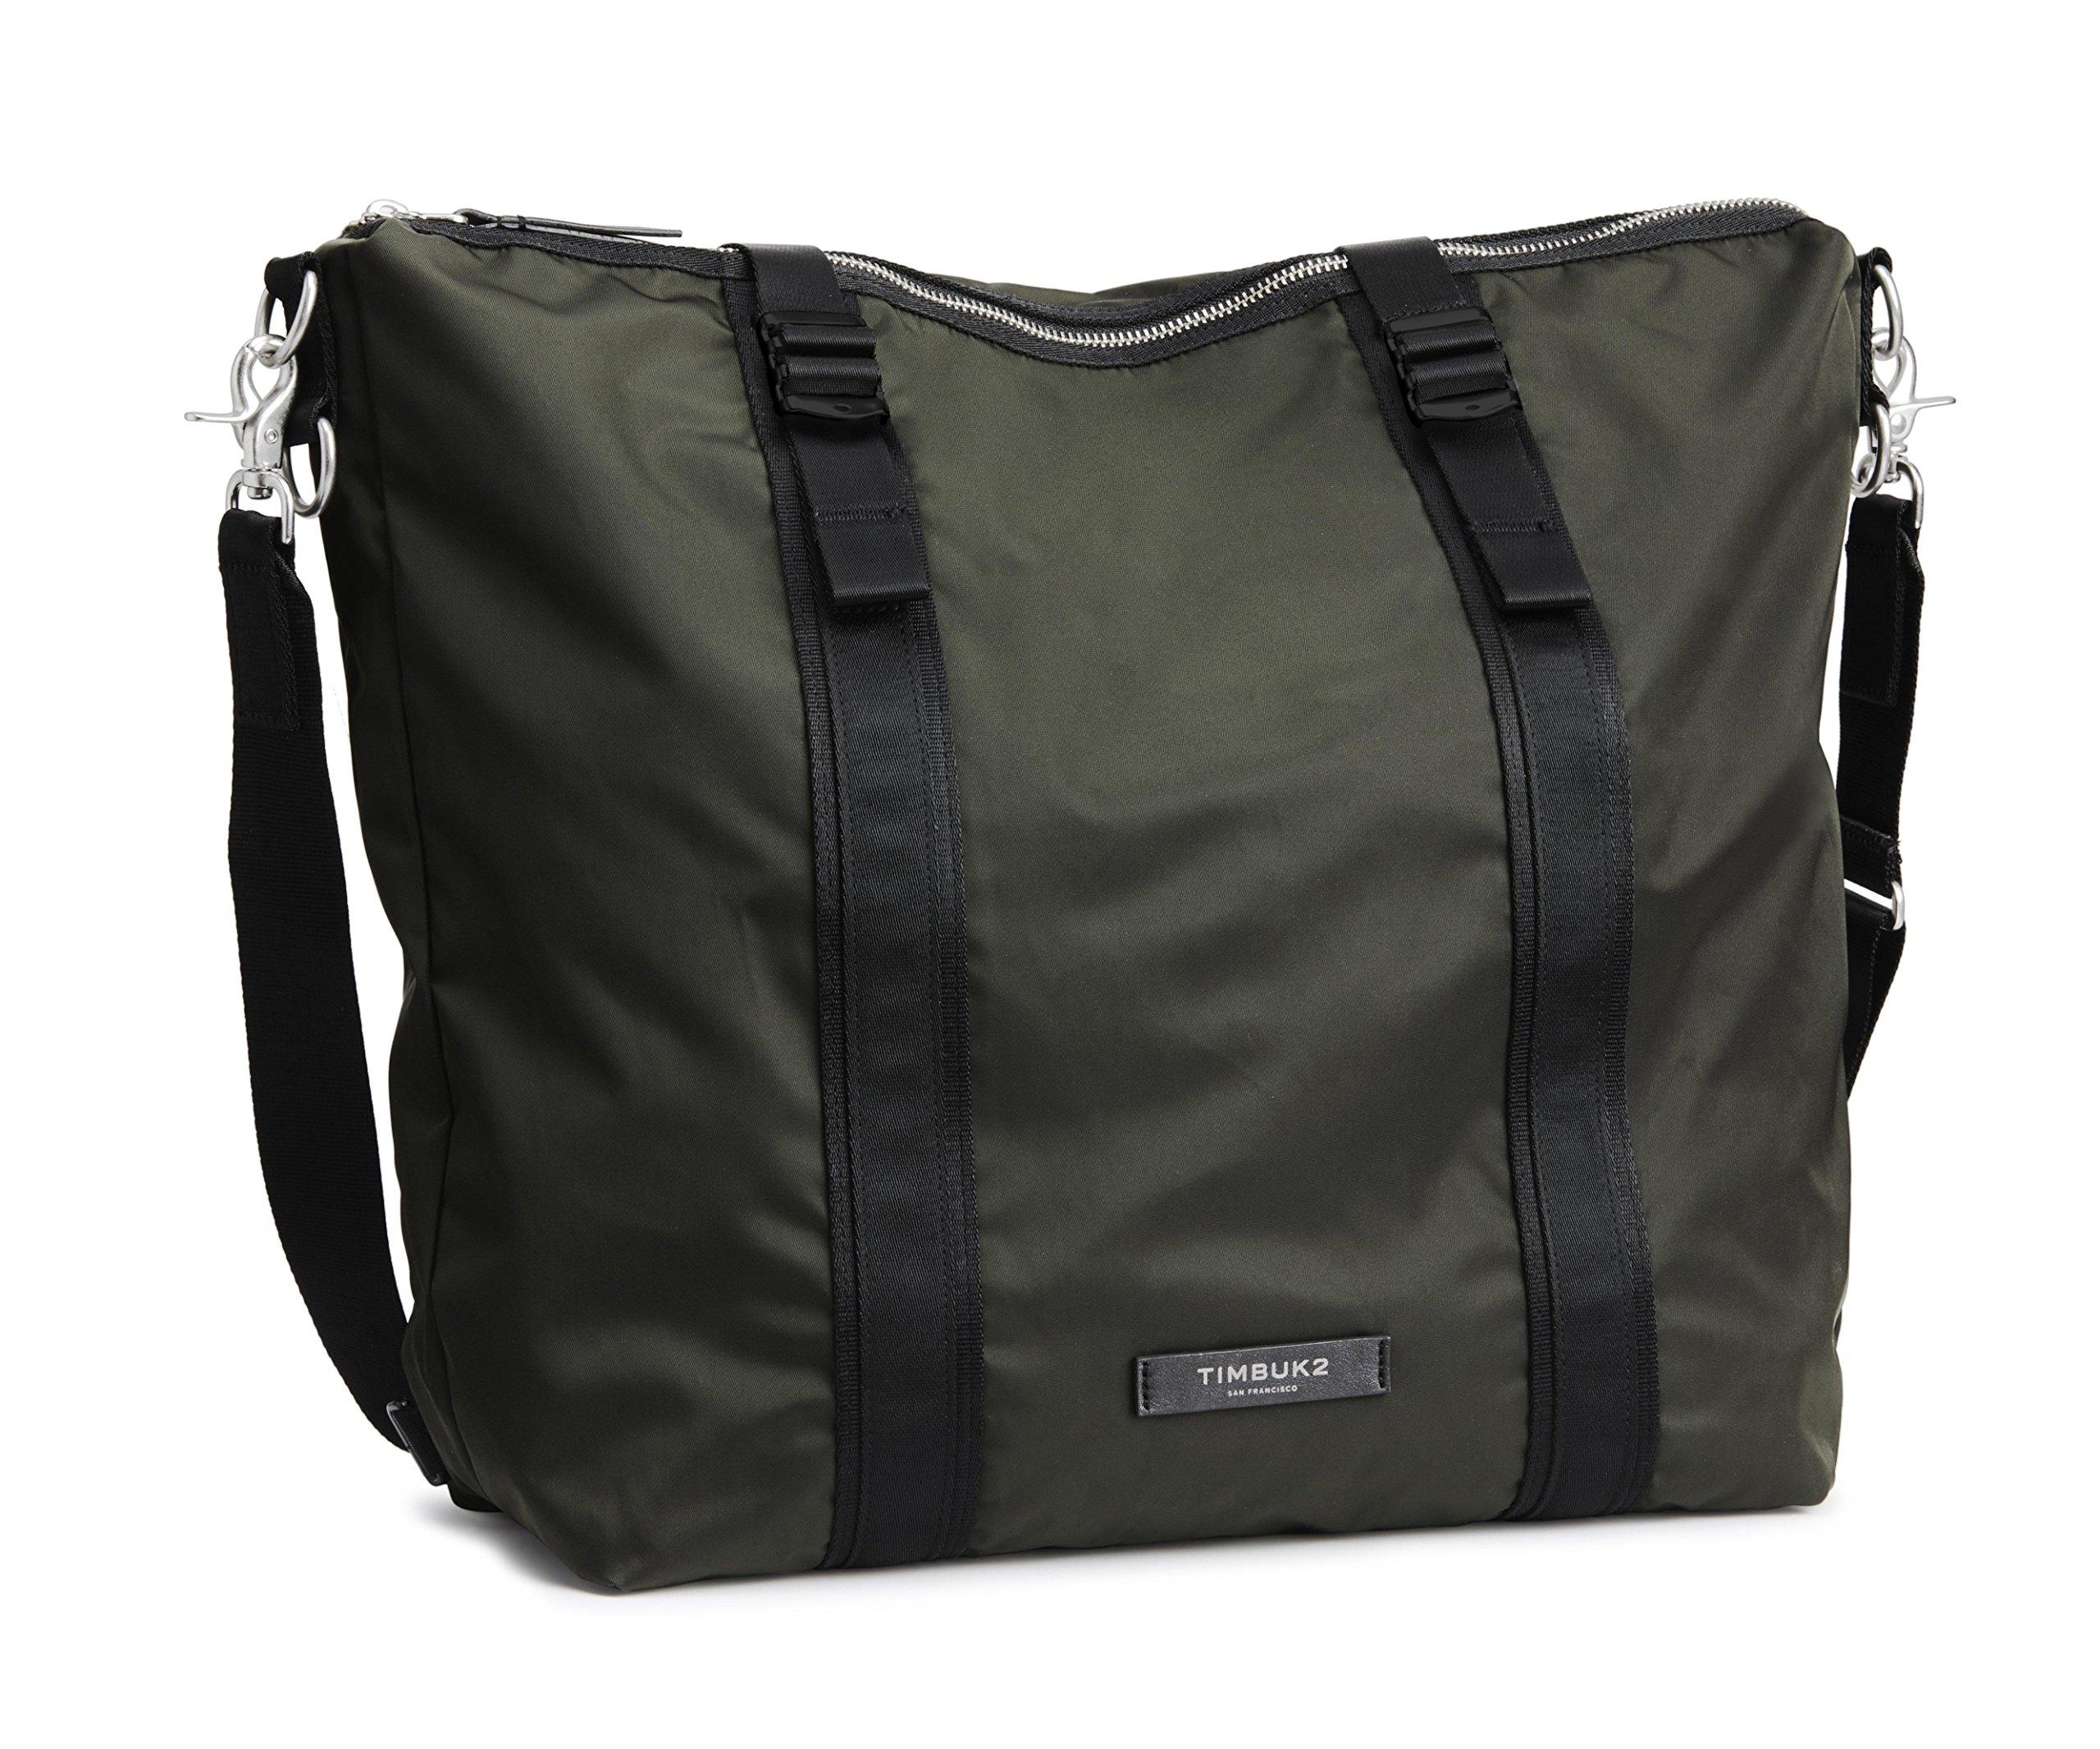 Timbuk2 Parcel Tote Shoulder Bag, One Size, Army by Timbuk2